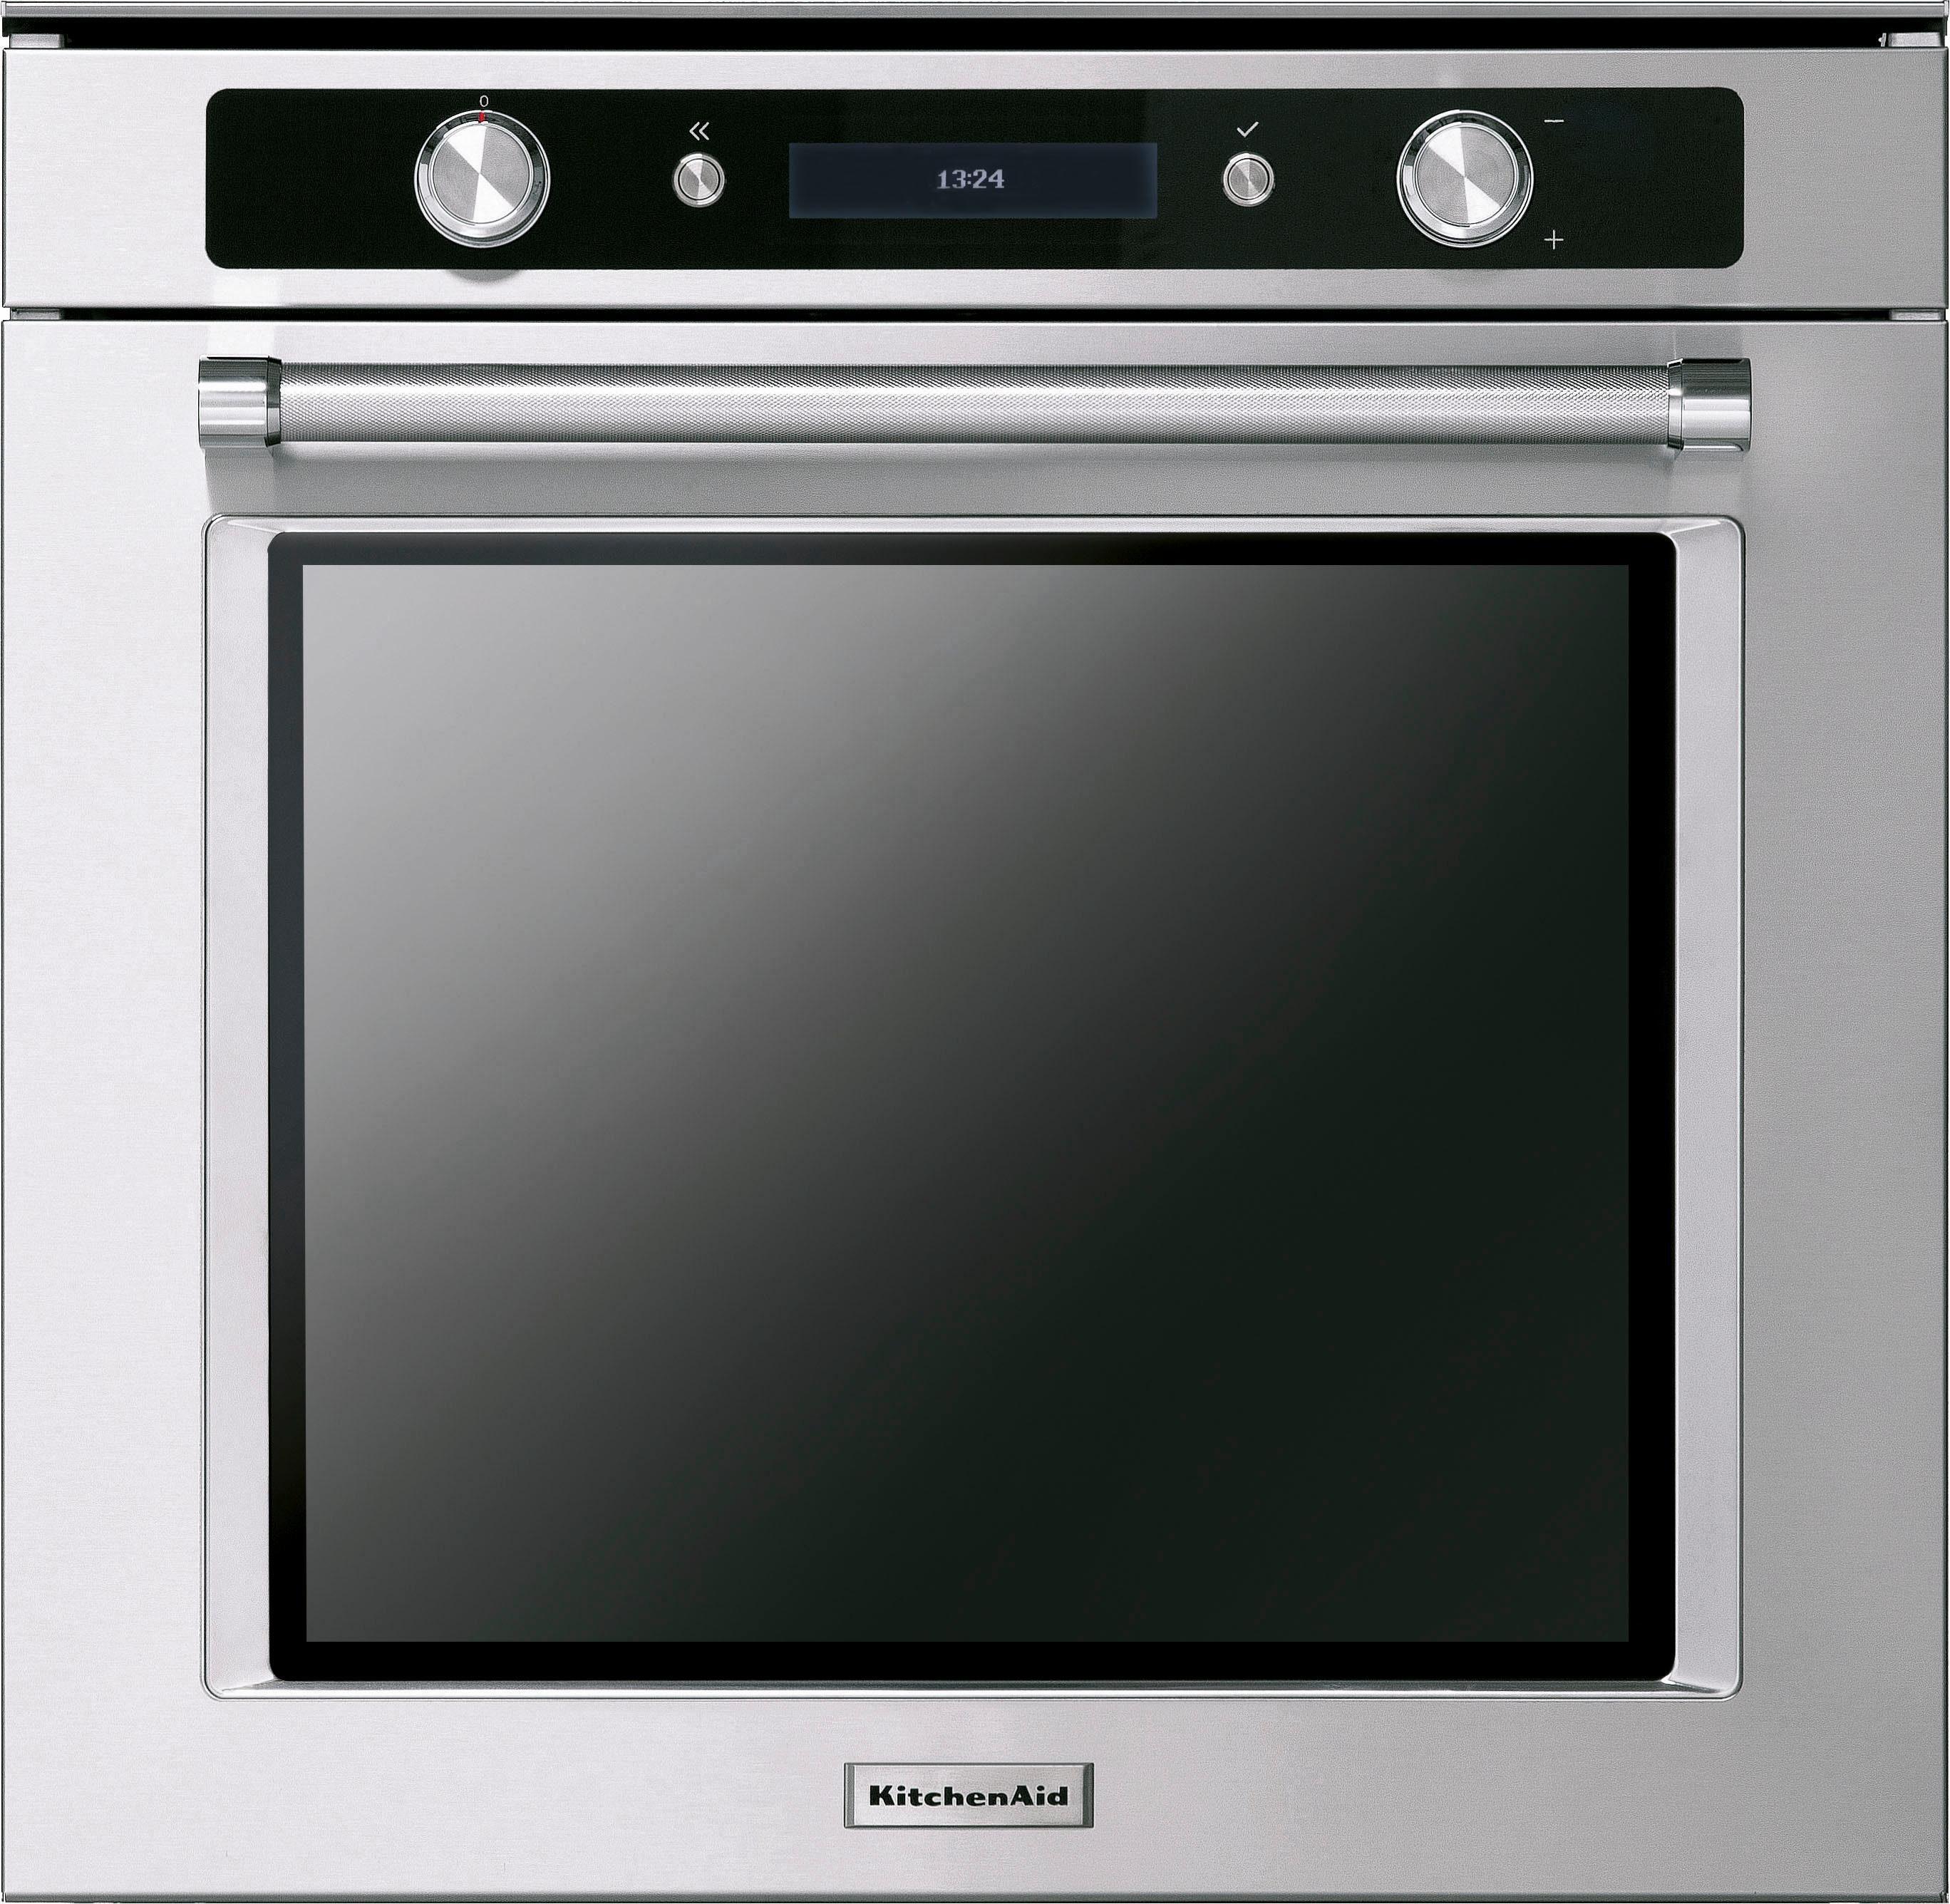 "KitchenAid Backofen mit Pyrolyse-Selbstreinigung ""KOHSP 60601"", A+"